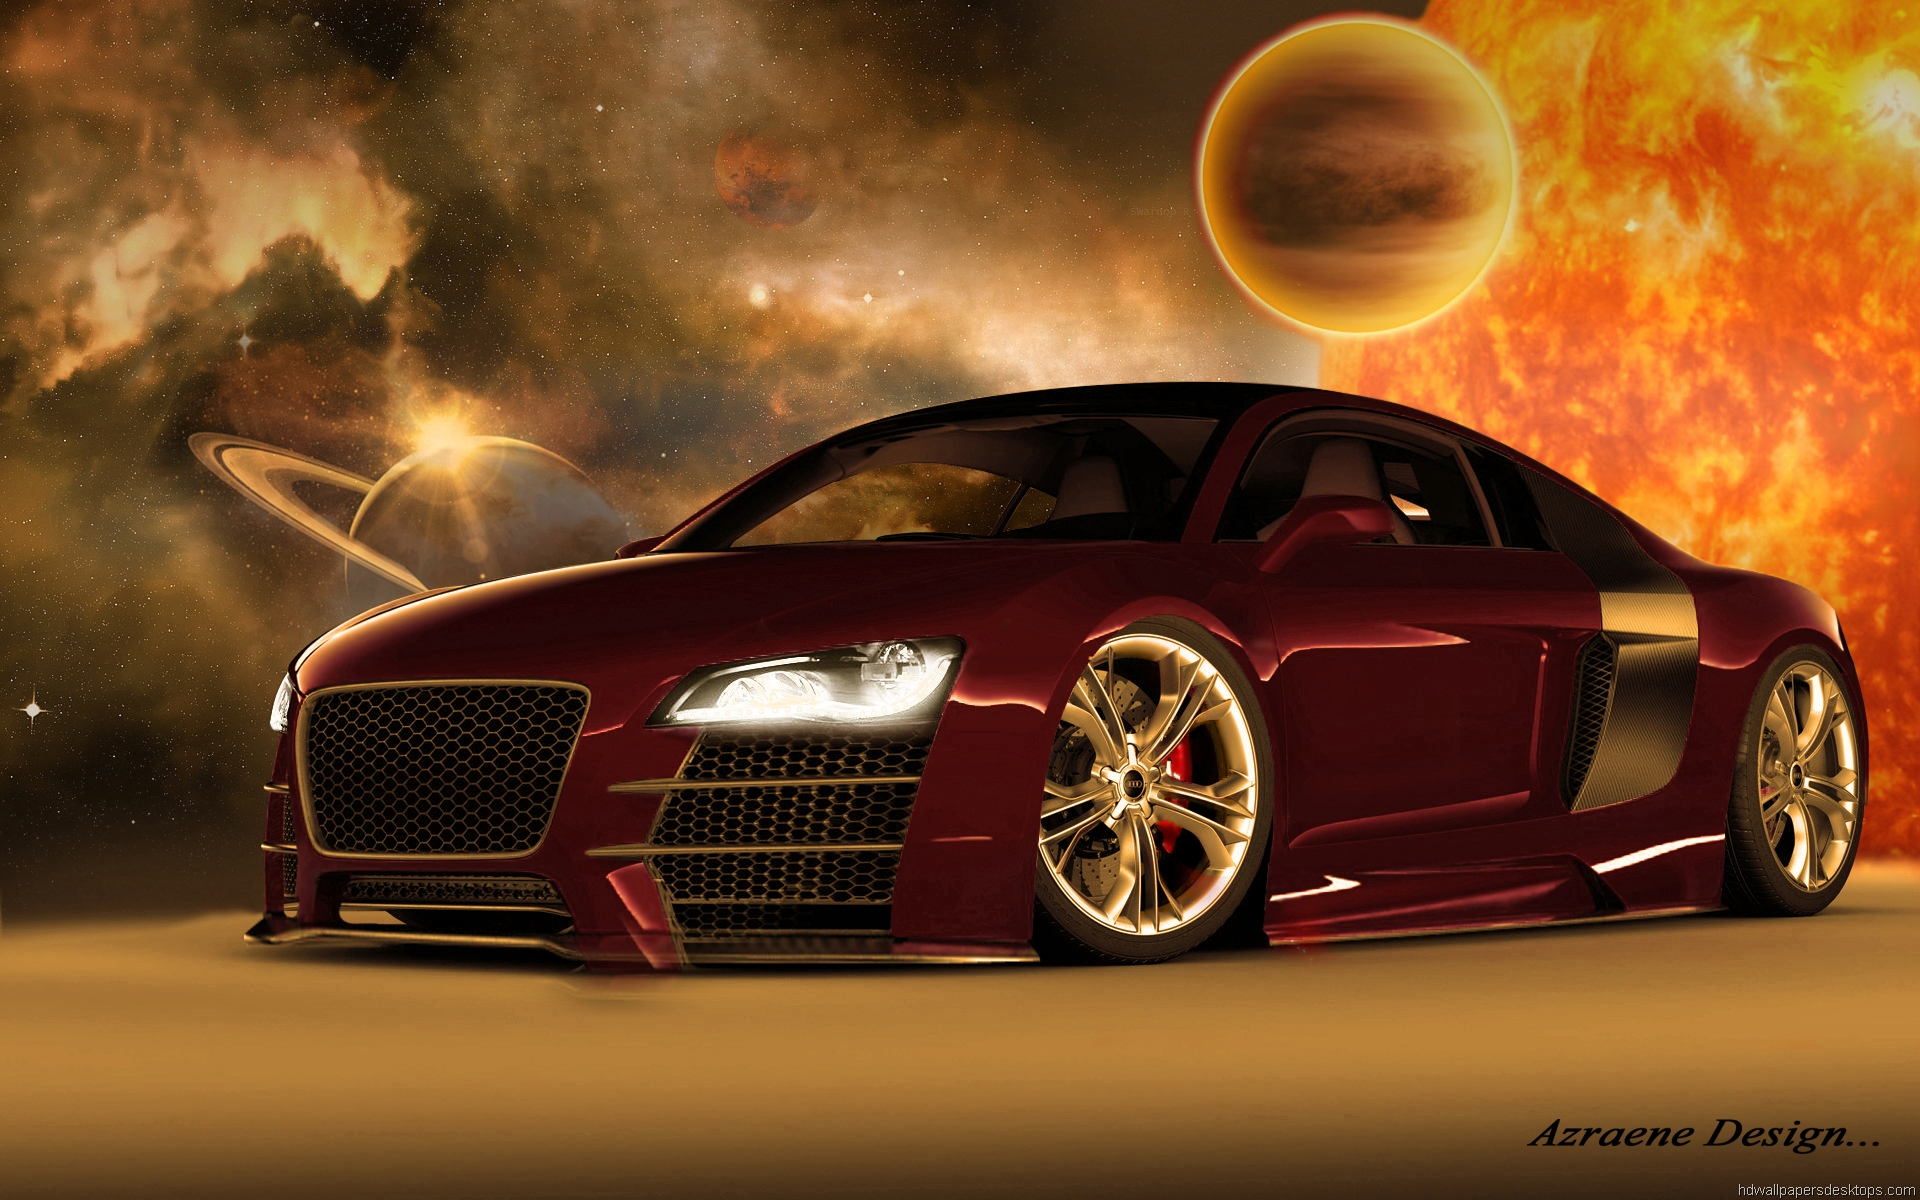 cars wallpapers hd full hd 1080p desktop backgrounds 1920x1200 1920x1200